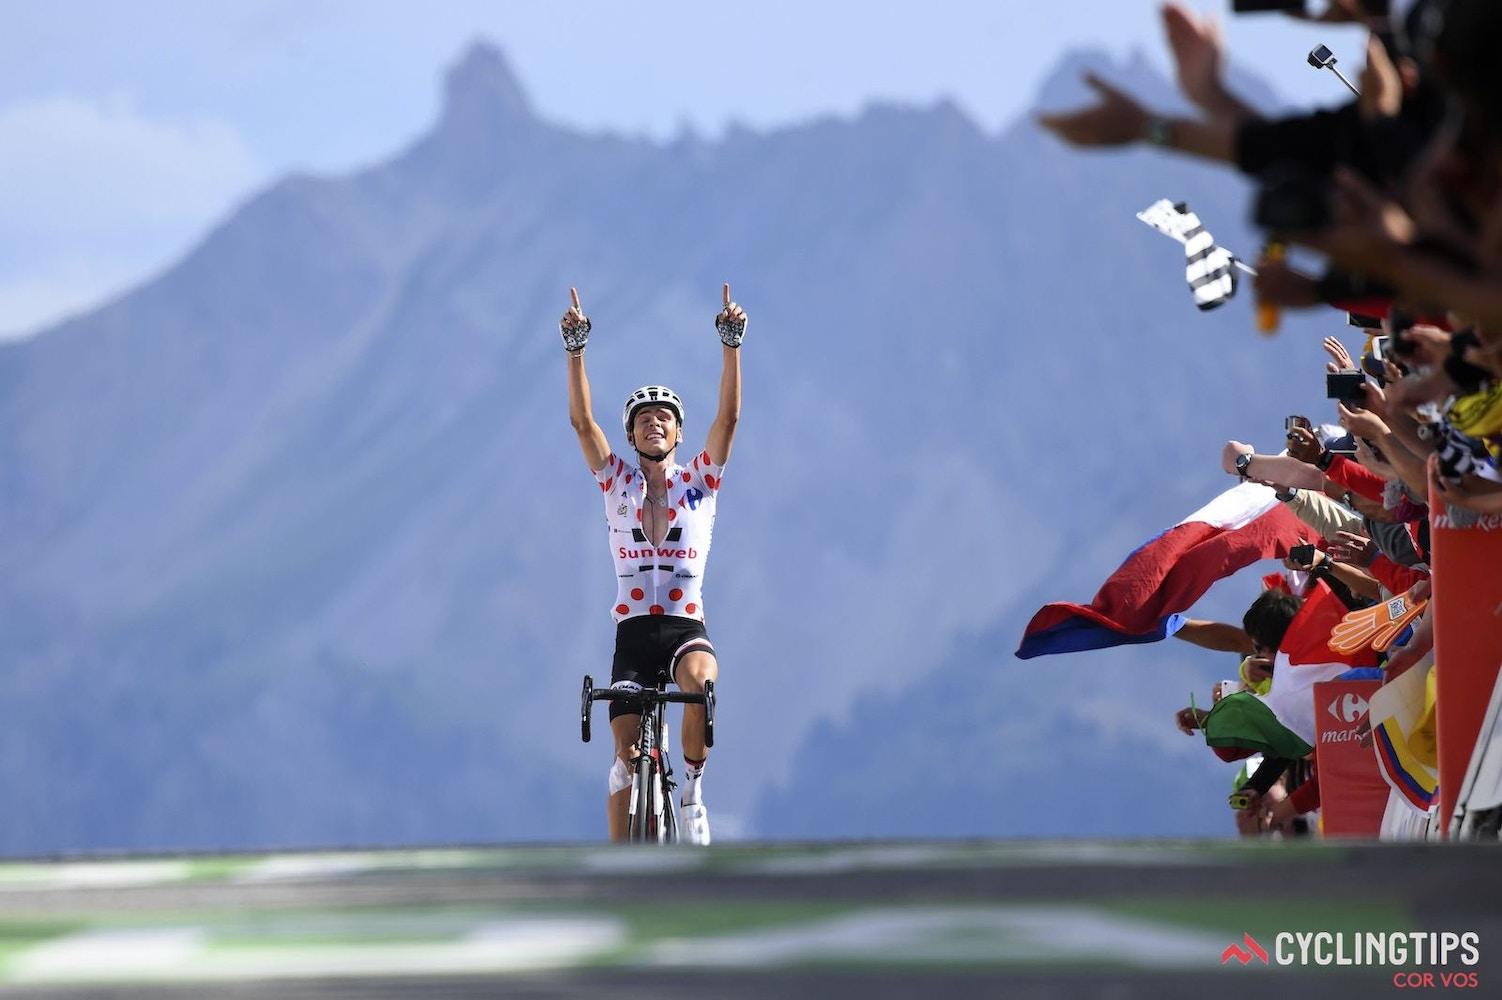 Tour de France 2017: Stage Eighteen Race Recap